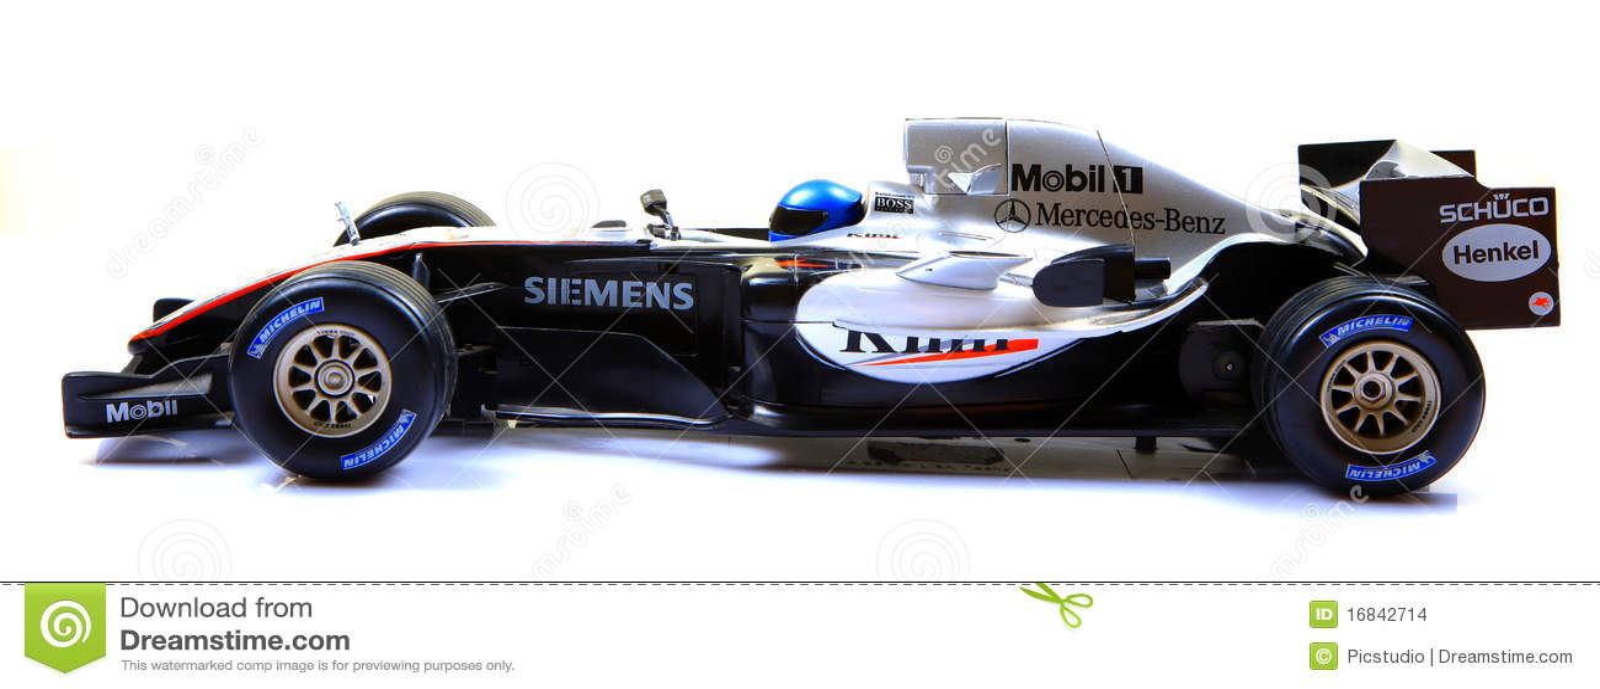 Mclaren Racing Car Side View Editorial Stock Image Image